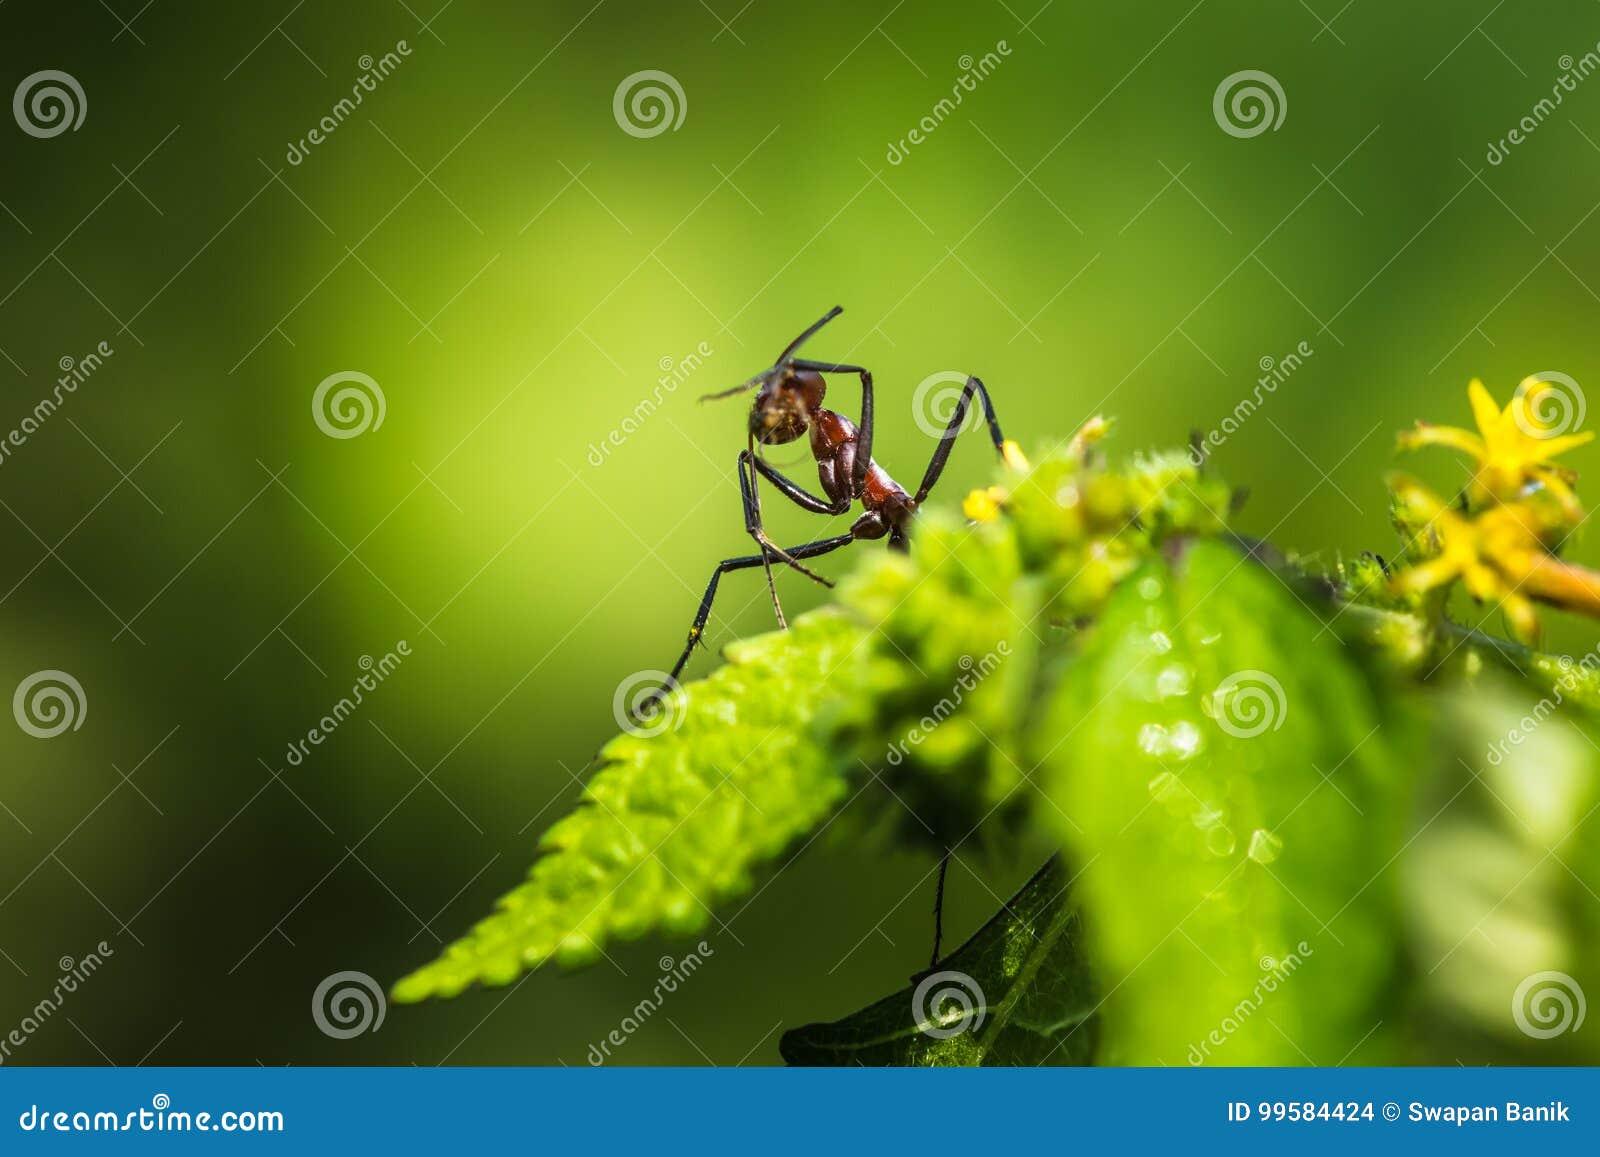 Hormigas gigantes rojas que picotean